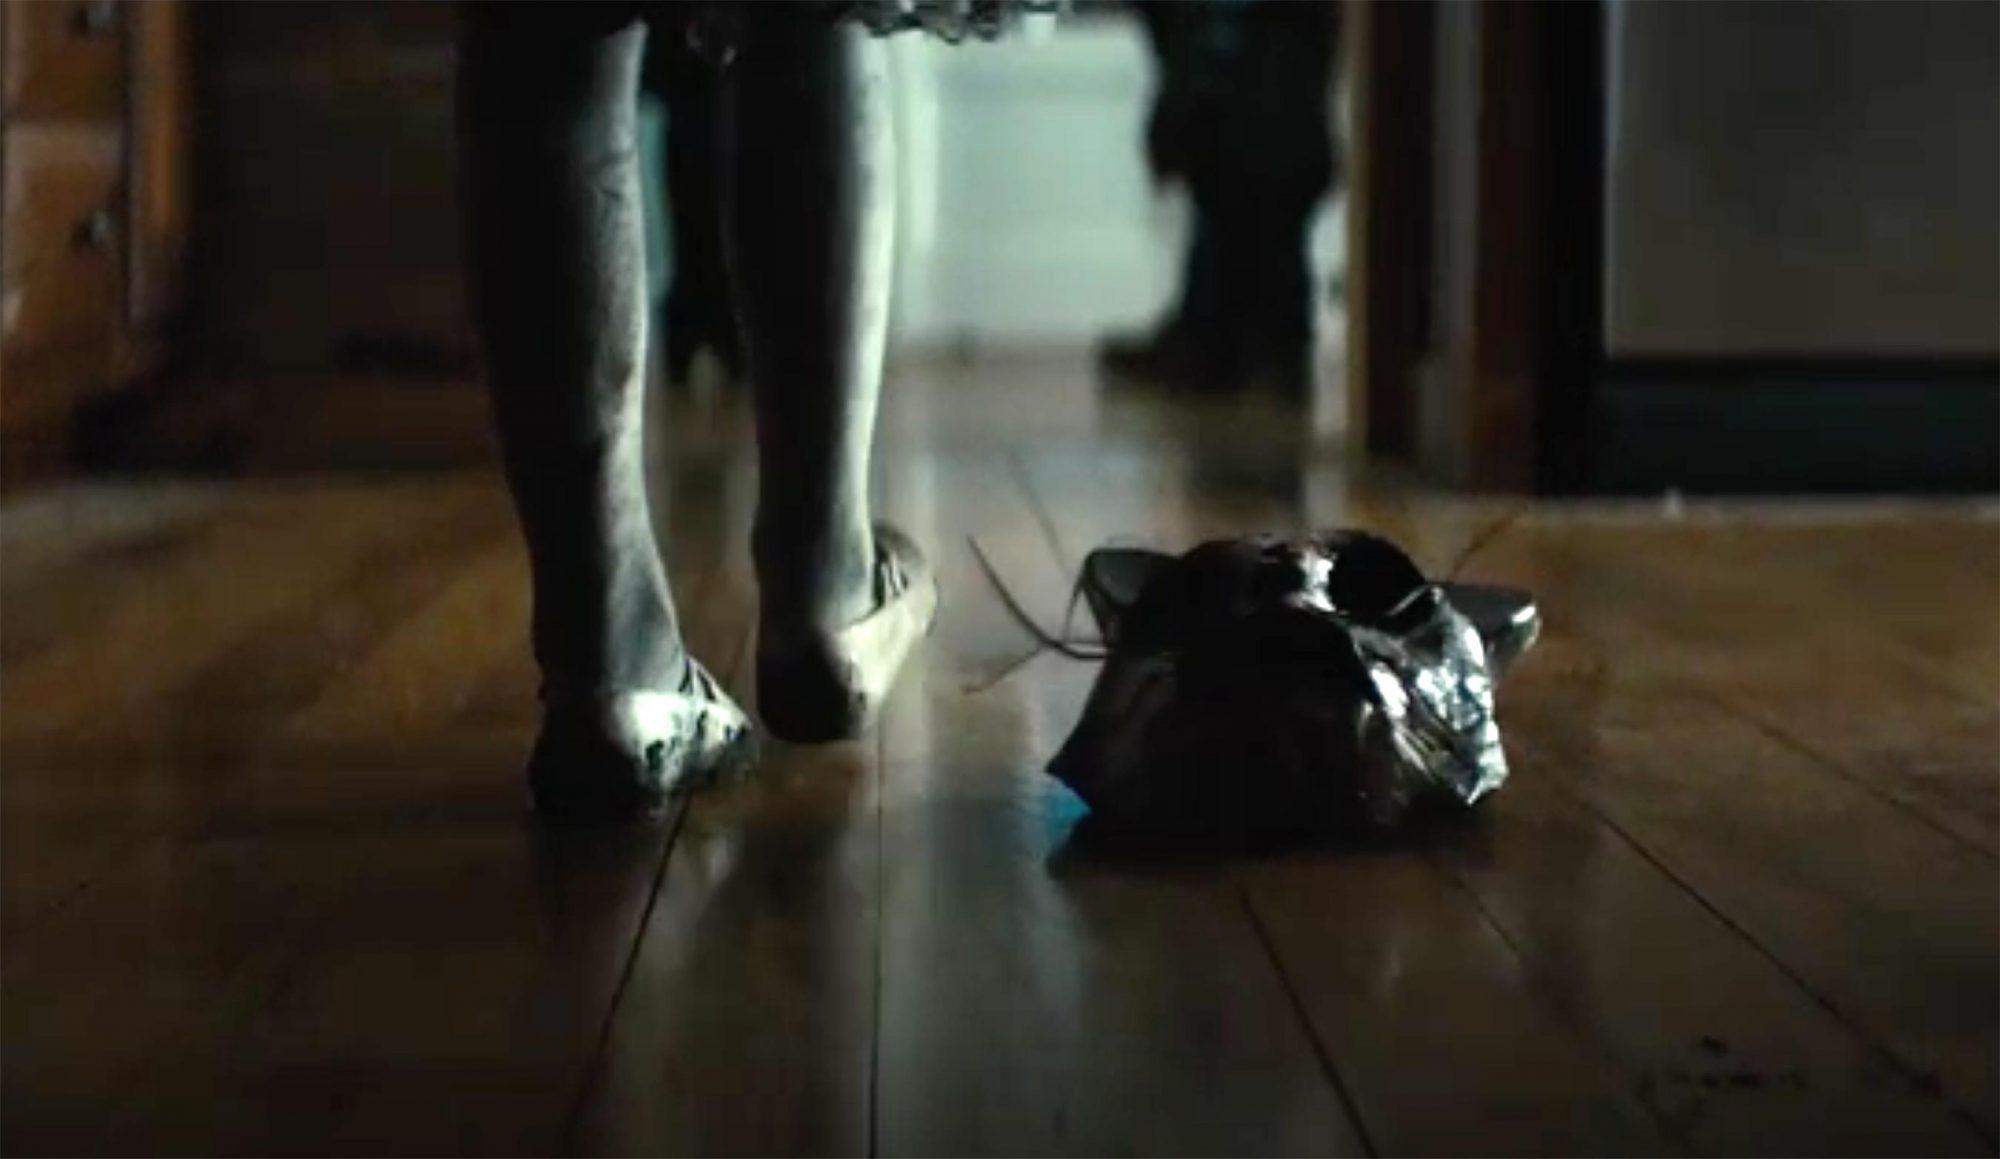 Pet Sematary (screen grab)Credit: Paramount Pictures